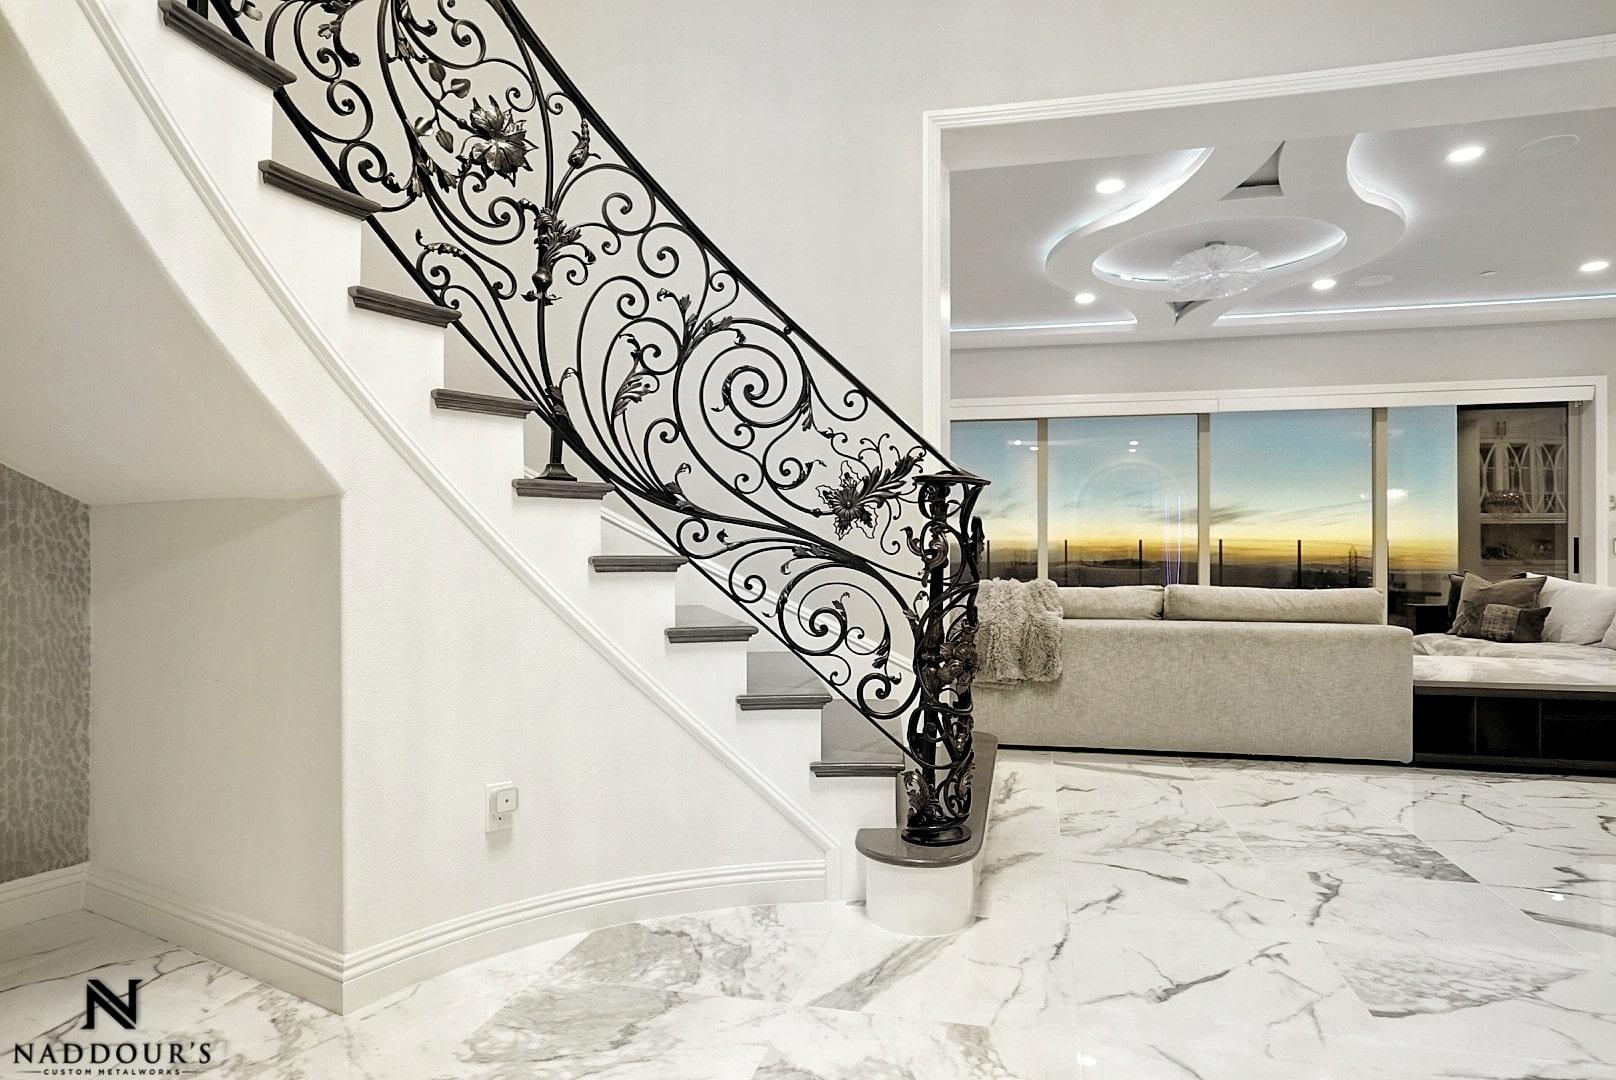 Naddour's Custom Metalworks Custom Staircase Railing Featured Project in Portola Hilla California .jpg 3.jpeg